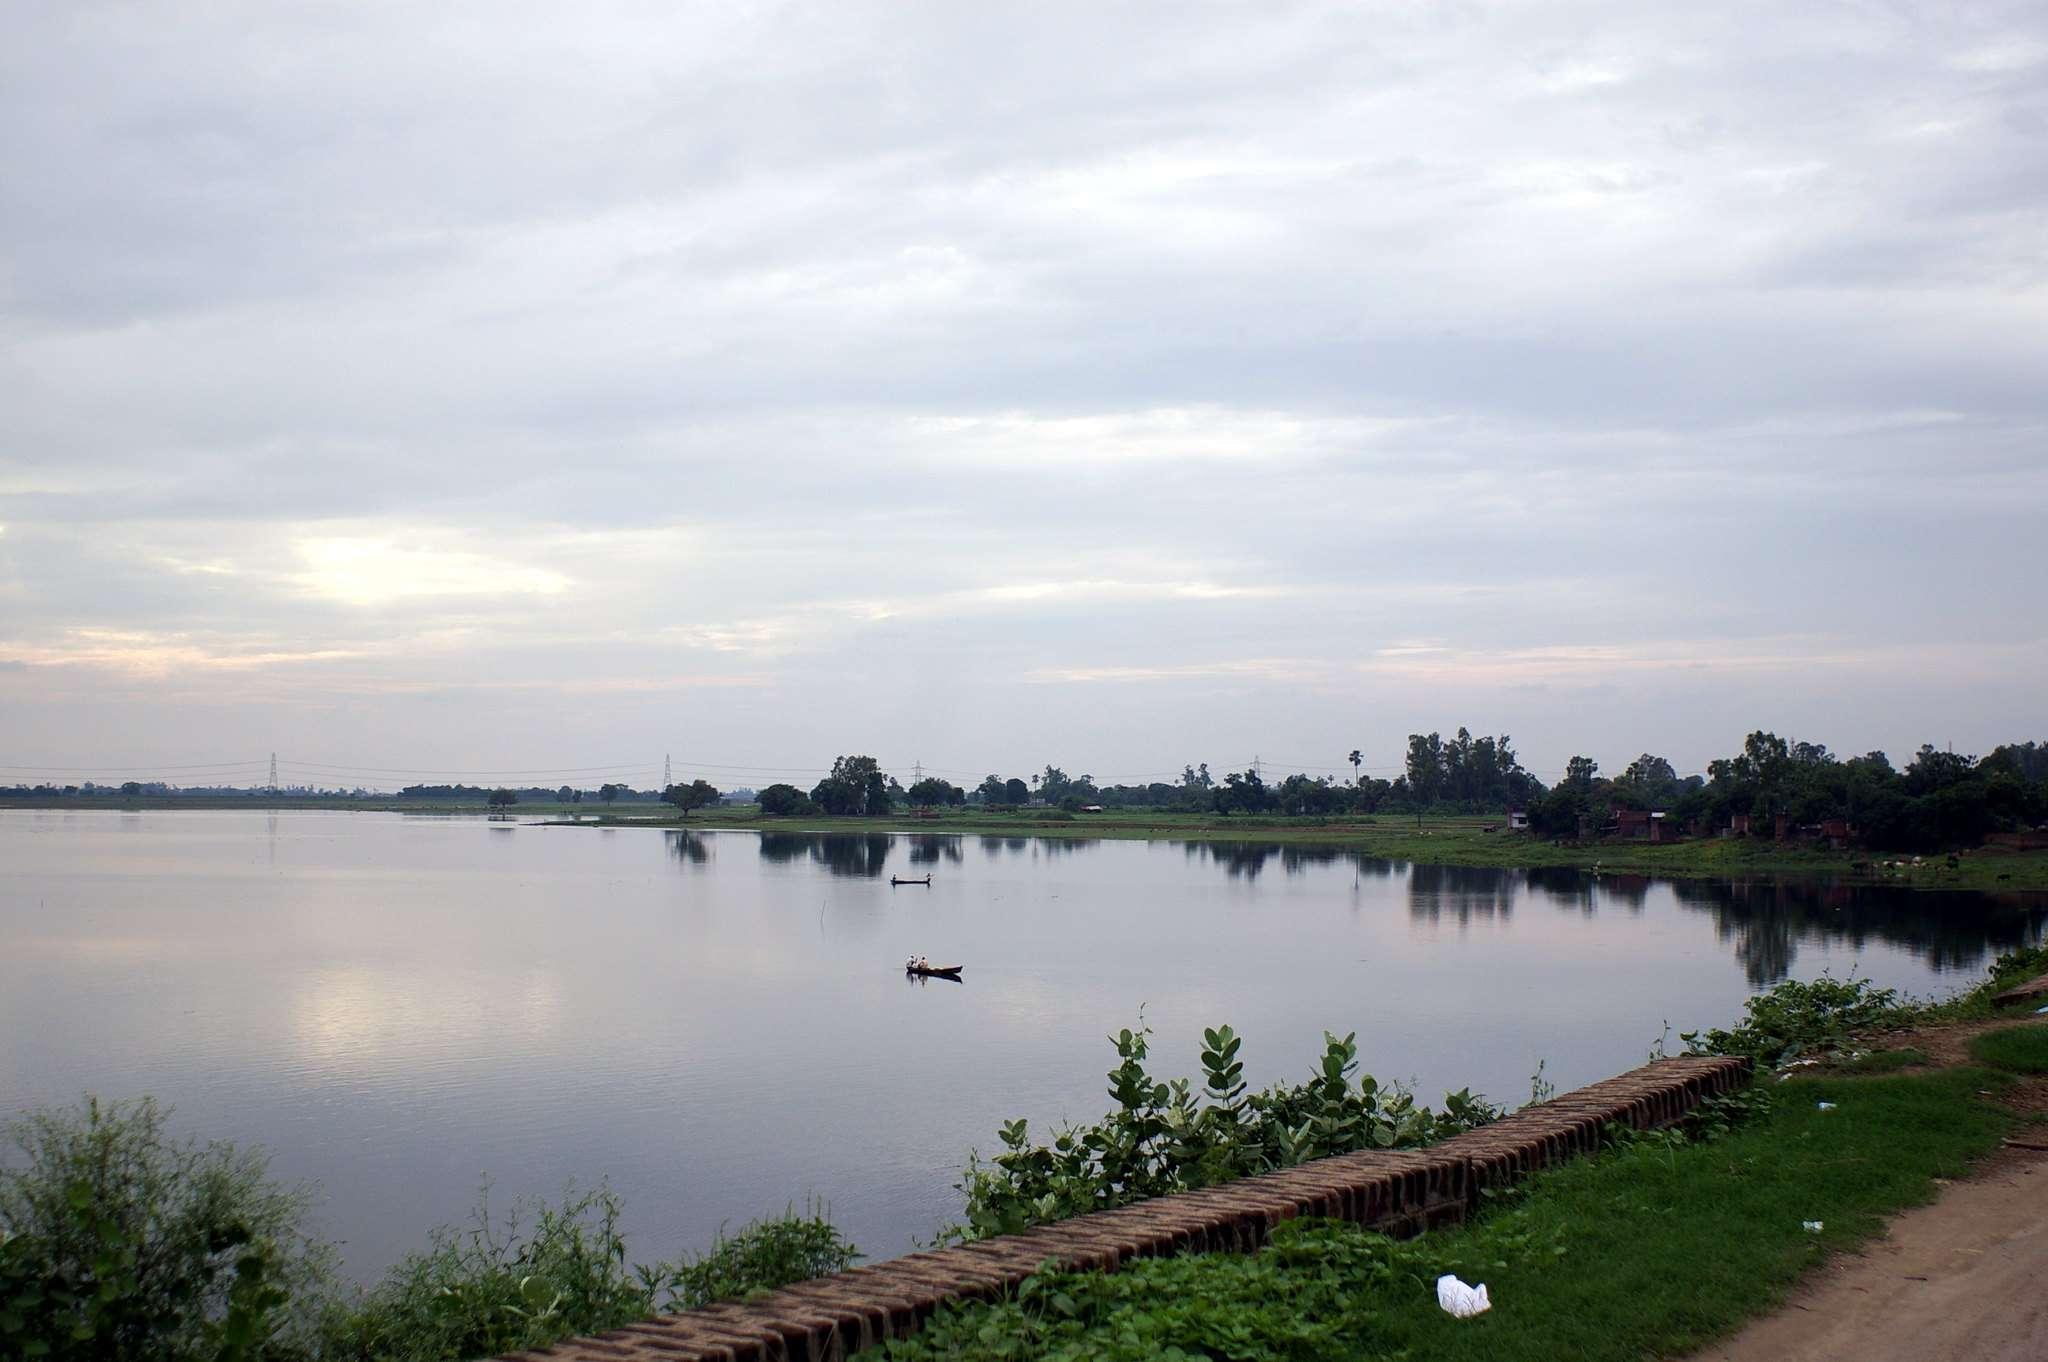 Ramgarh Lake in Gorakhpur